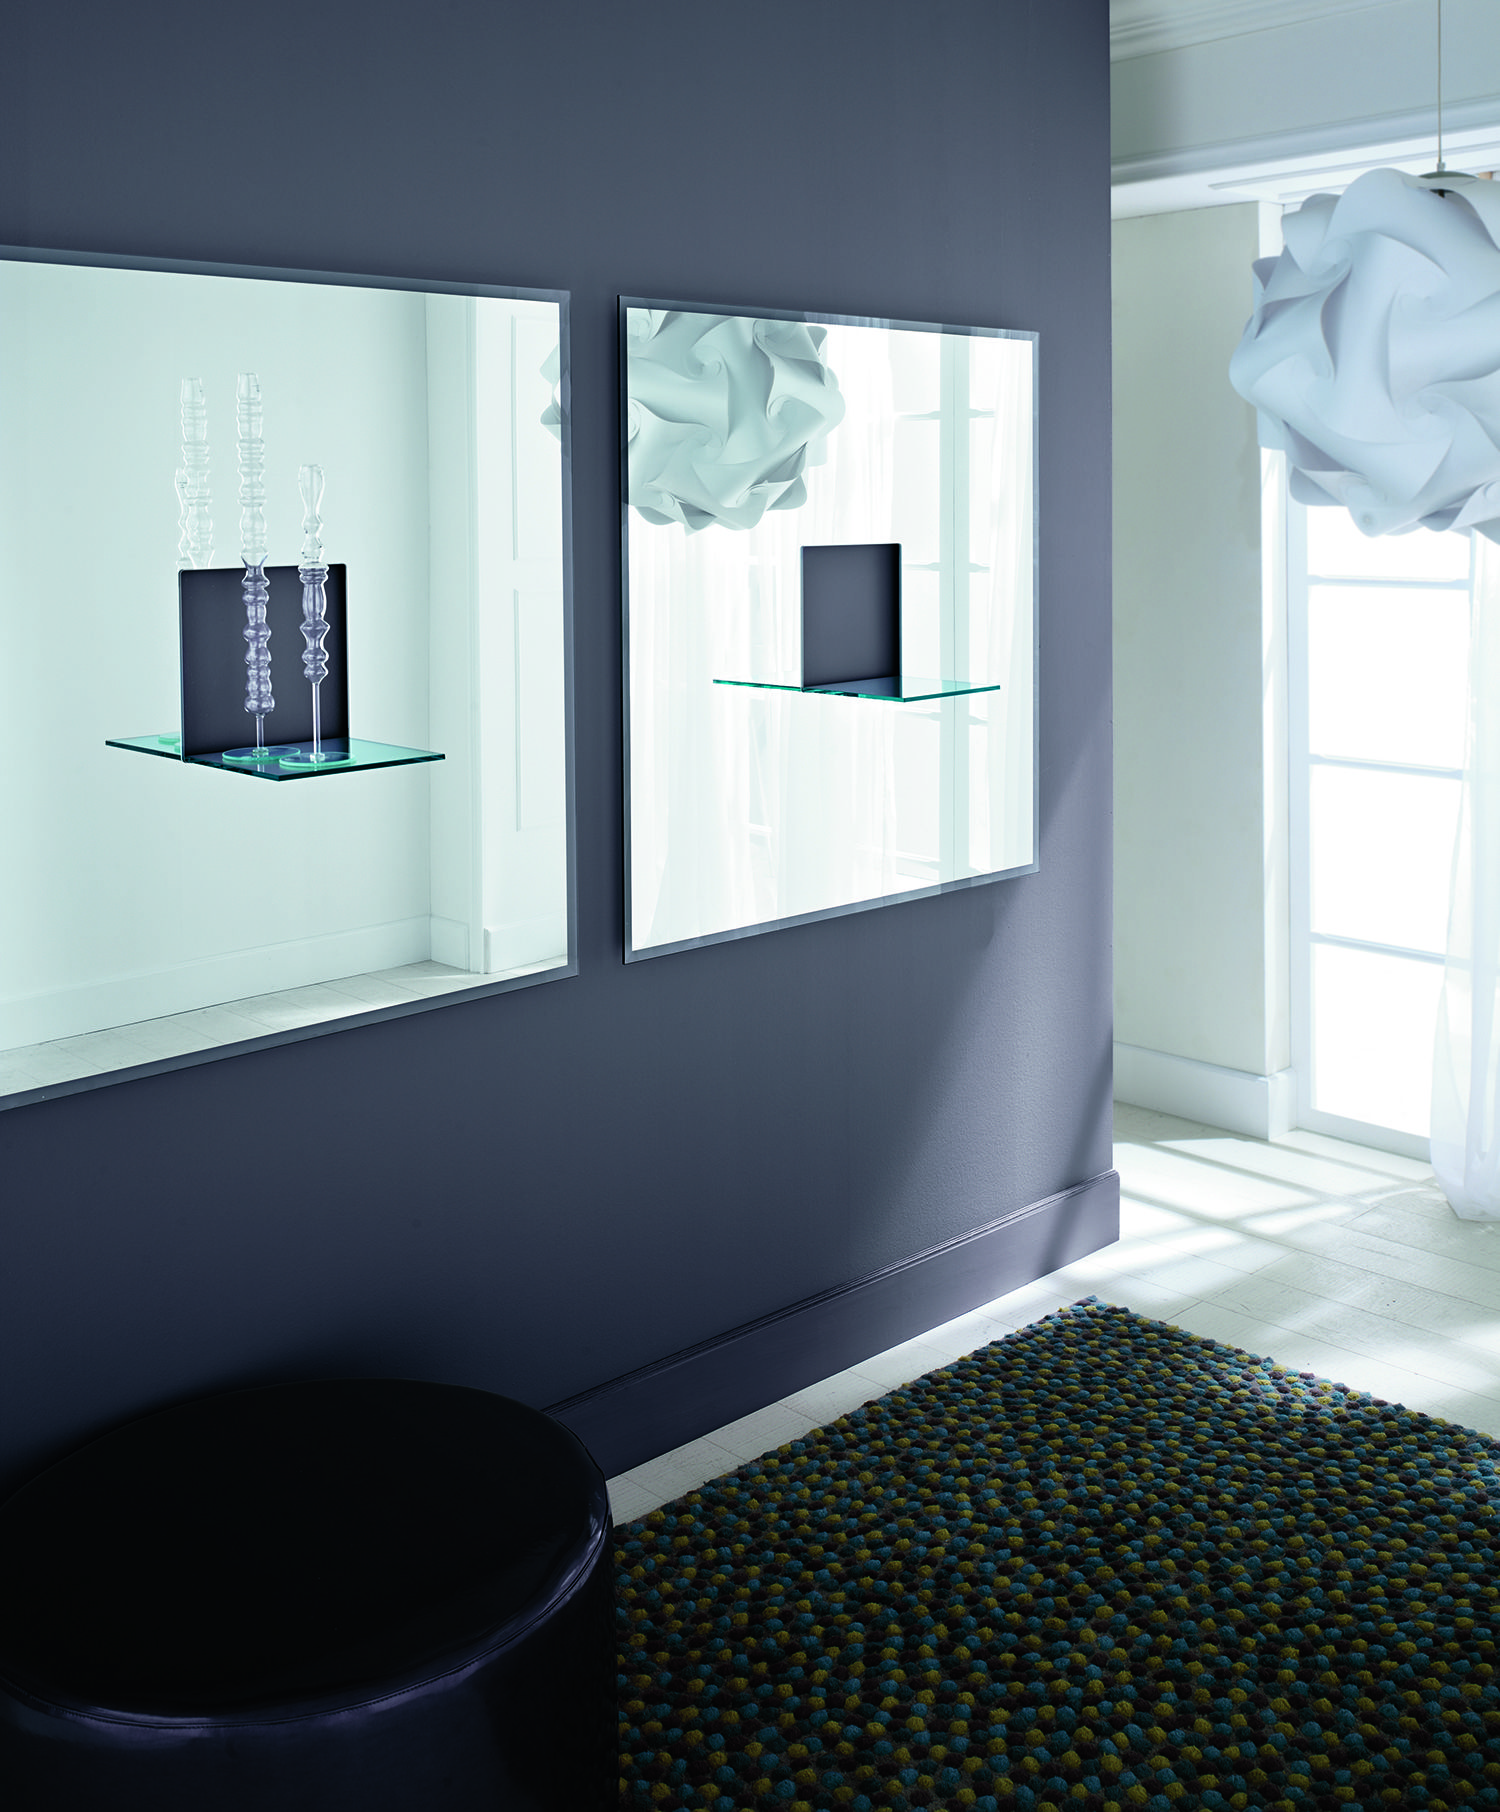 Essenza Mirror by Tonelli | Tonelli | Pinterest | Moderno ... - Essenza Mirror by Tonelli